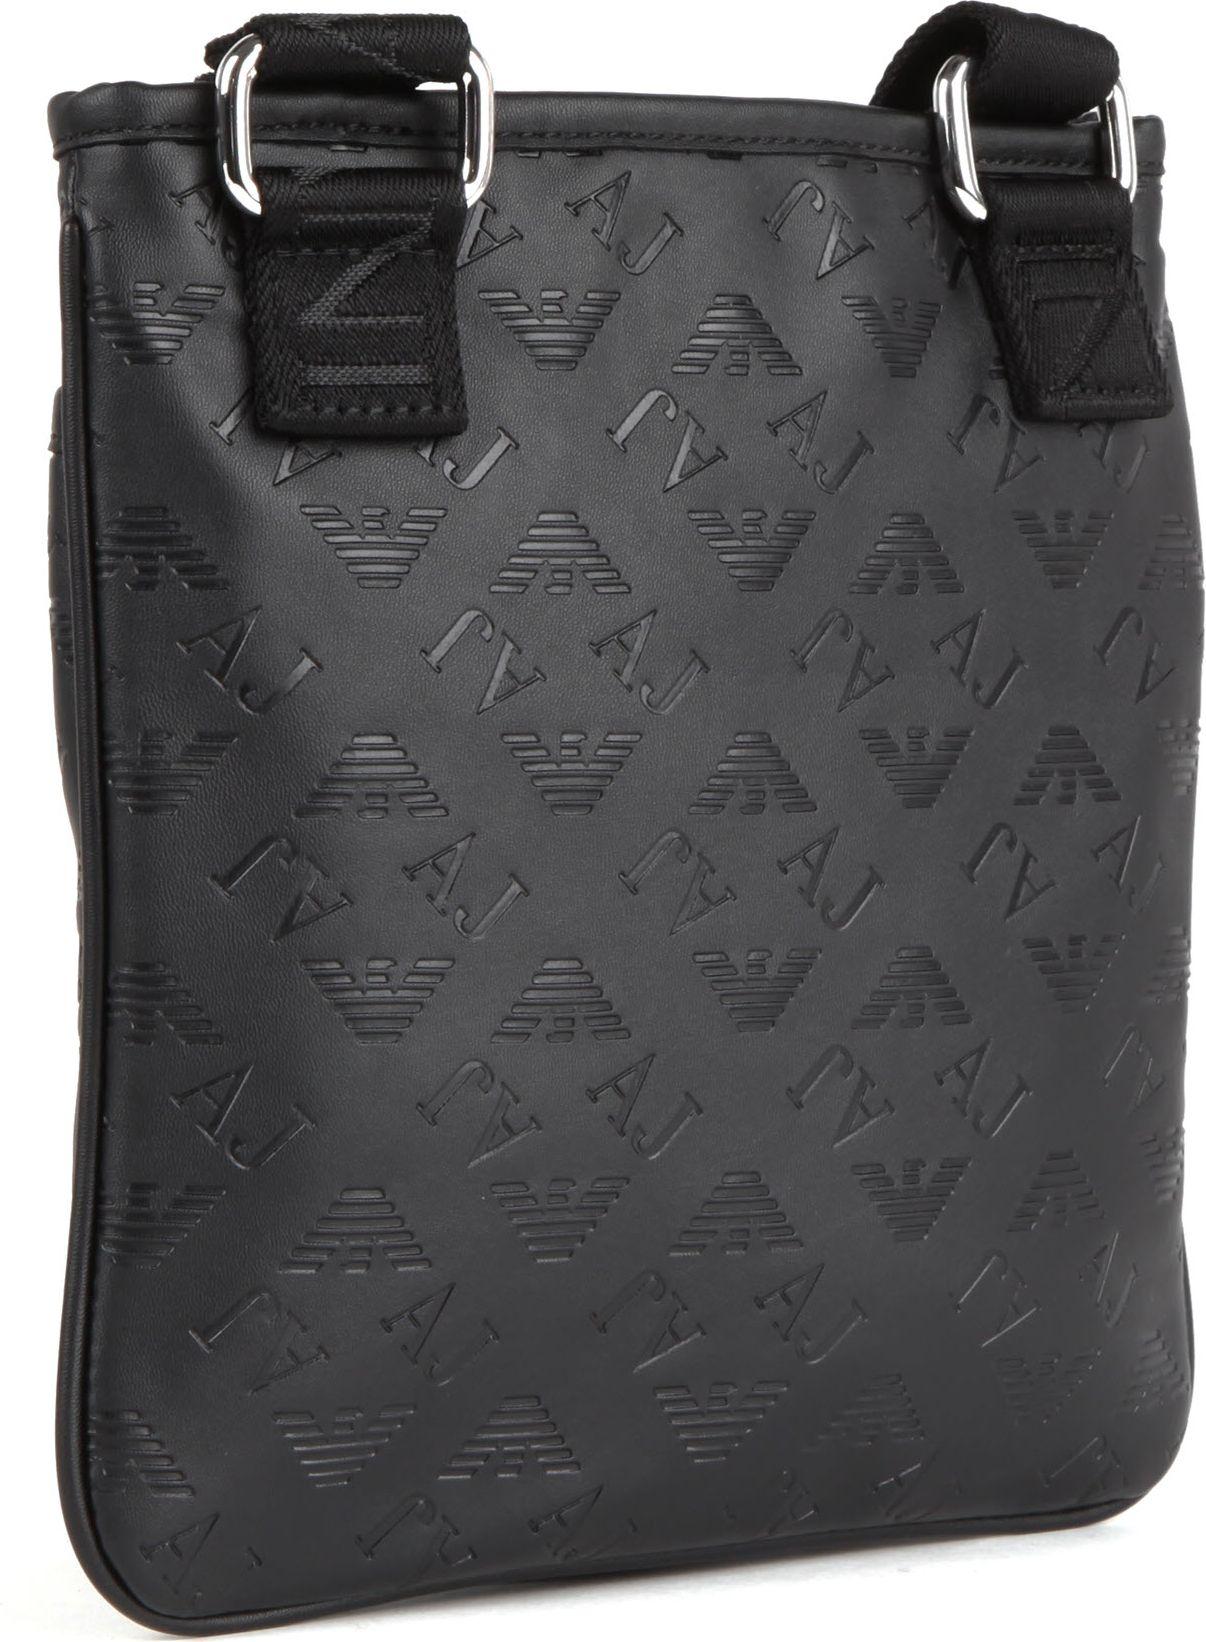 Armani Jeans Fauxleather Messenger Bag In Black For Men Lyst